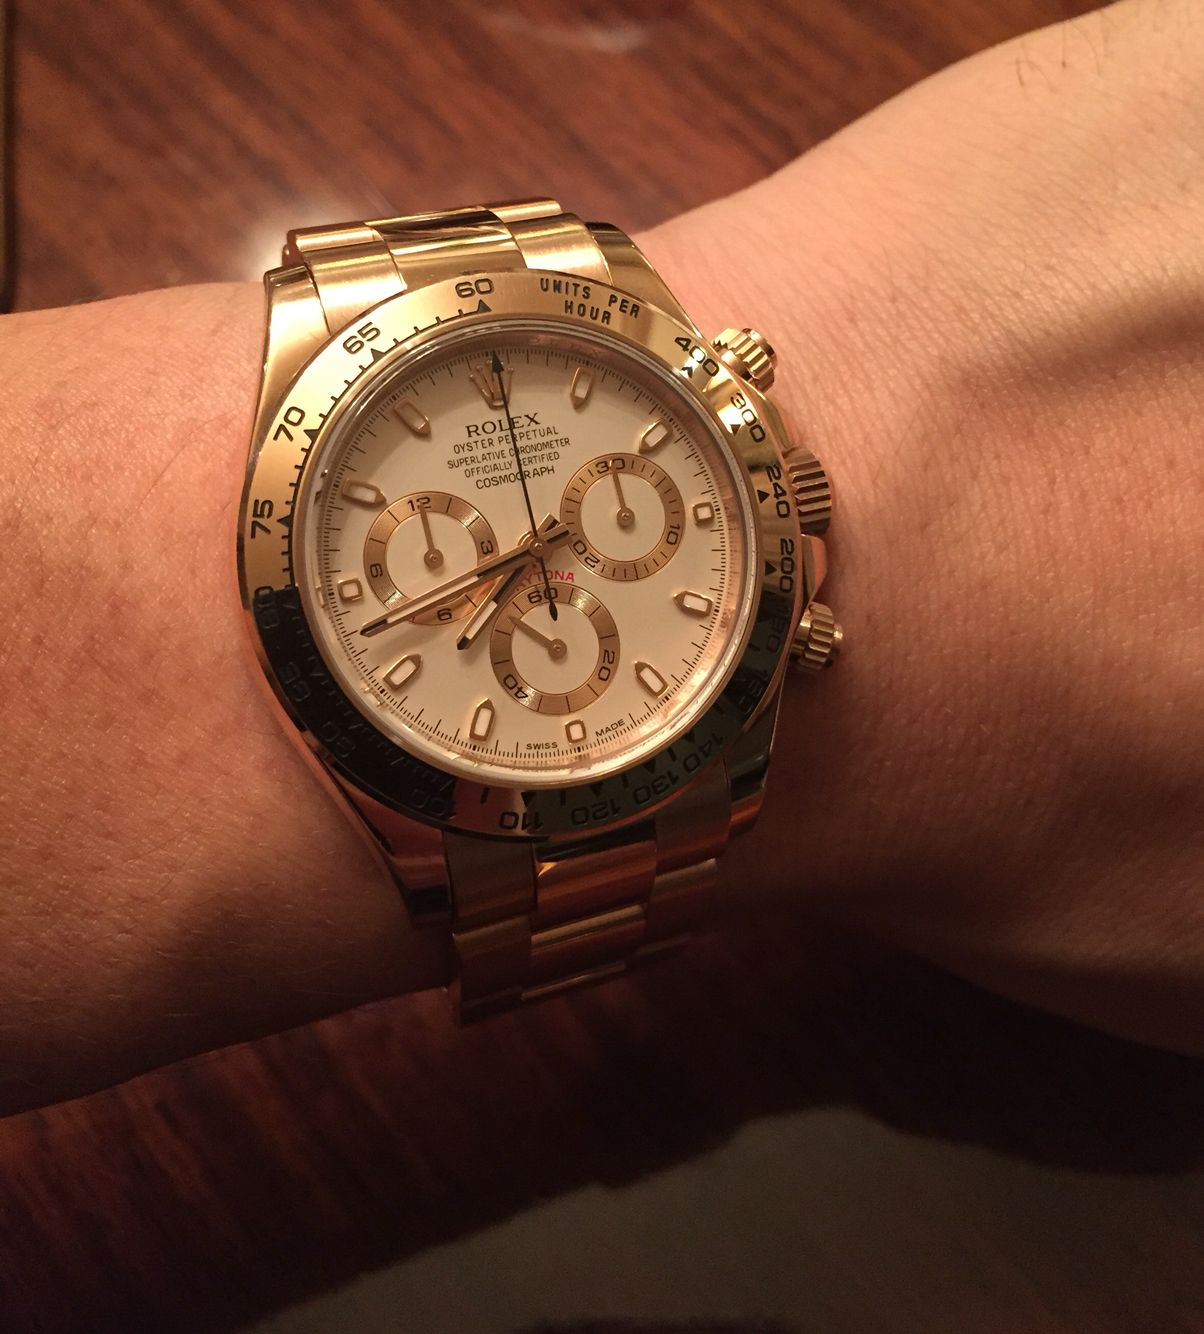 Rolex Daytona Rose Gold On Wrist